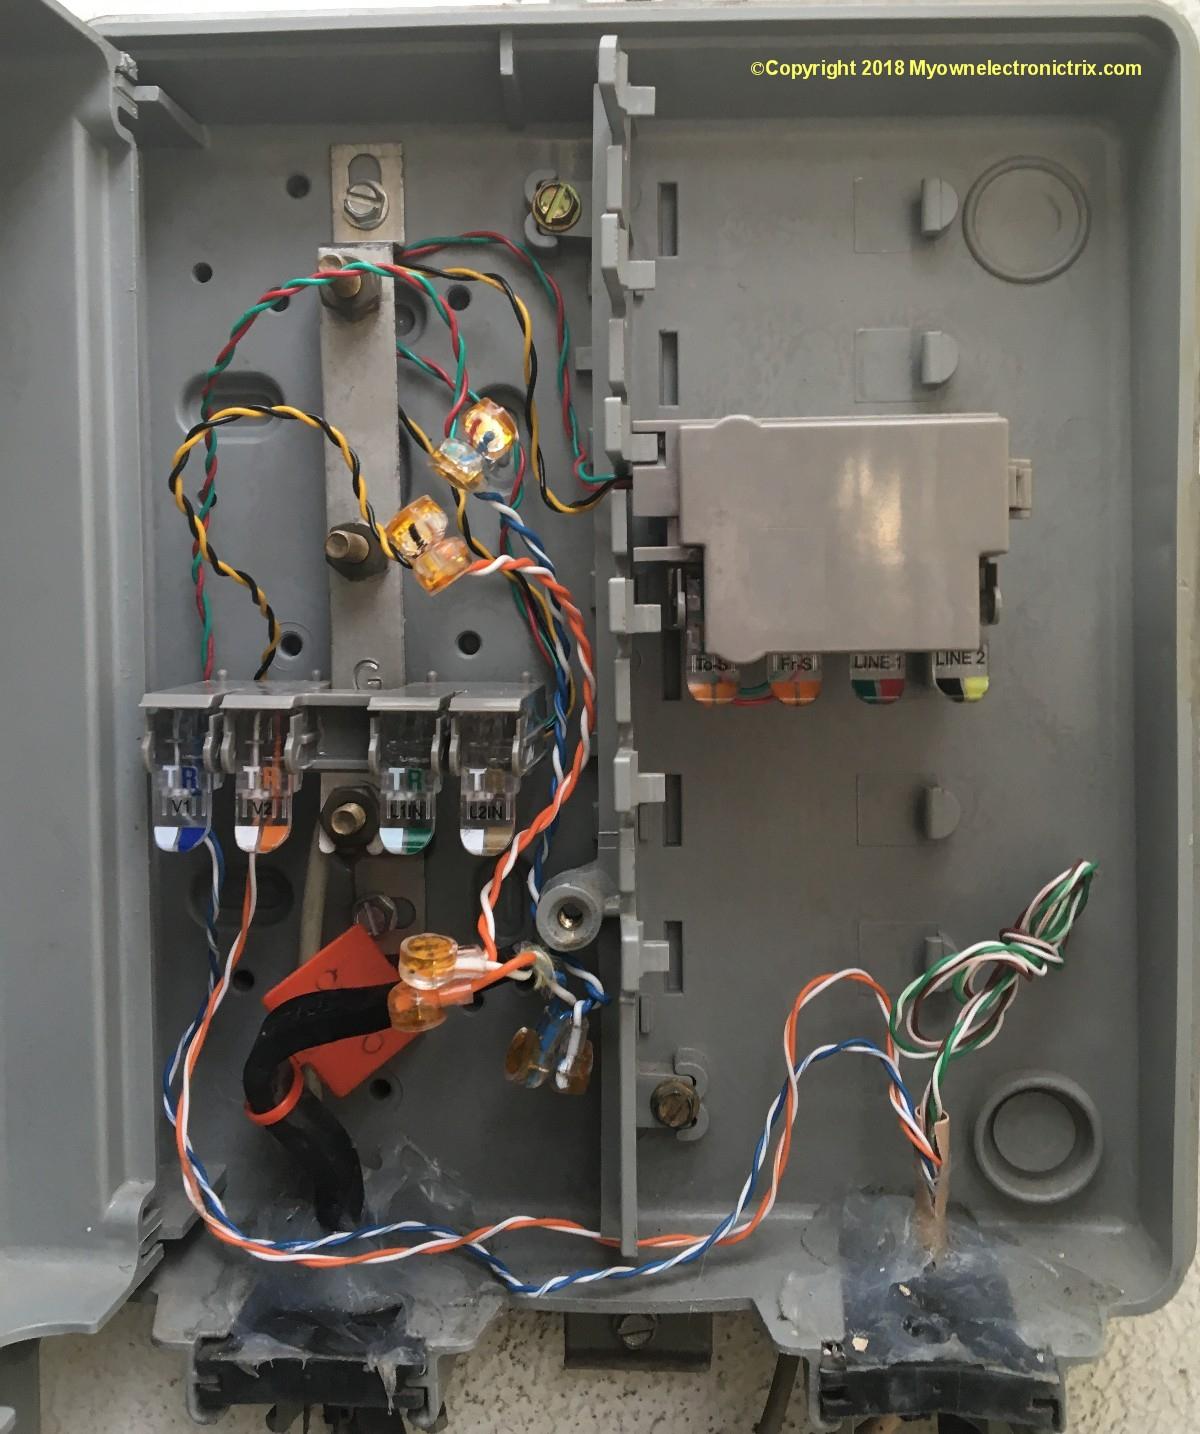 Telephone Wiring Diagram Outside Box | Wiring Diagram - Telephone Wiring Diagram Outside Box